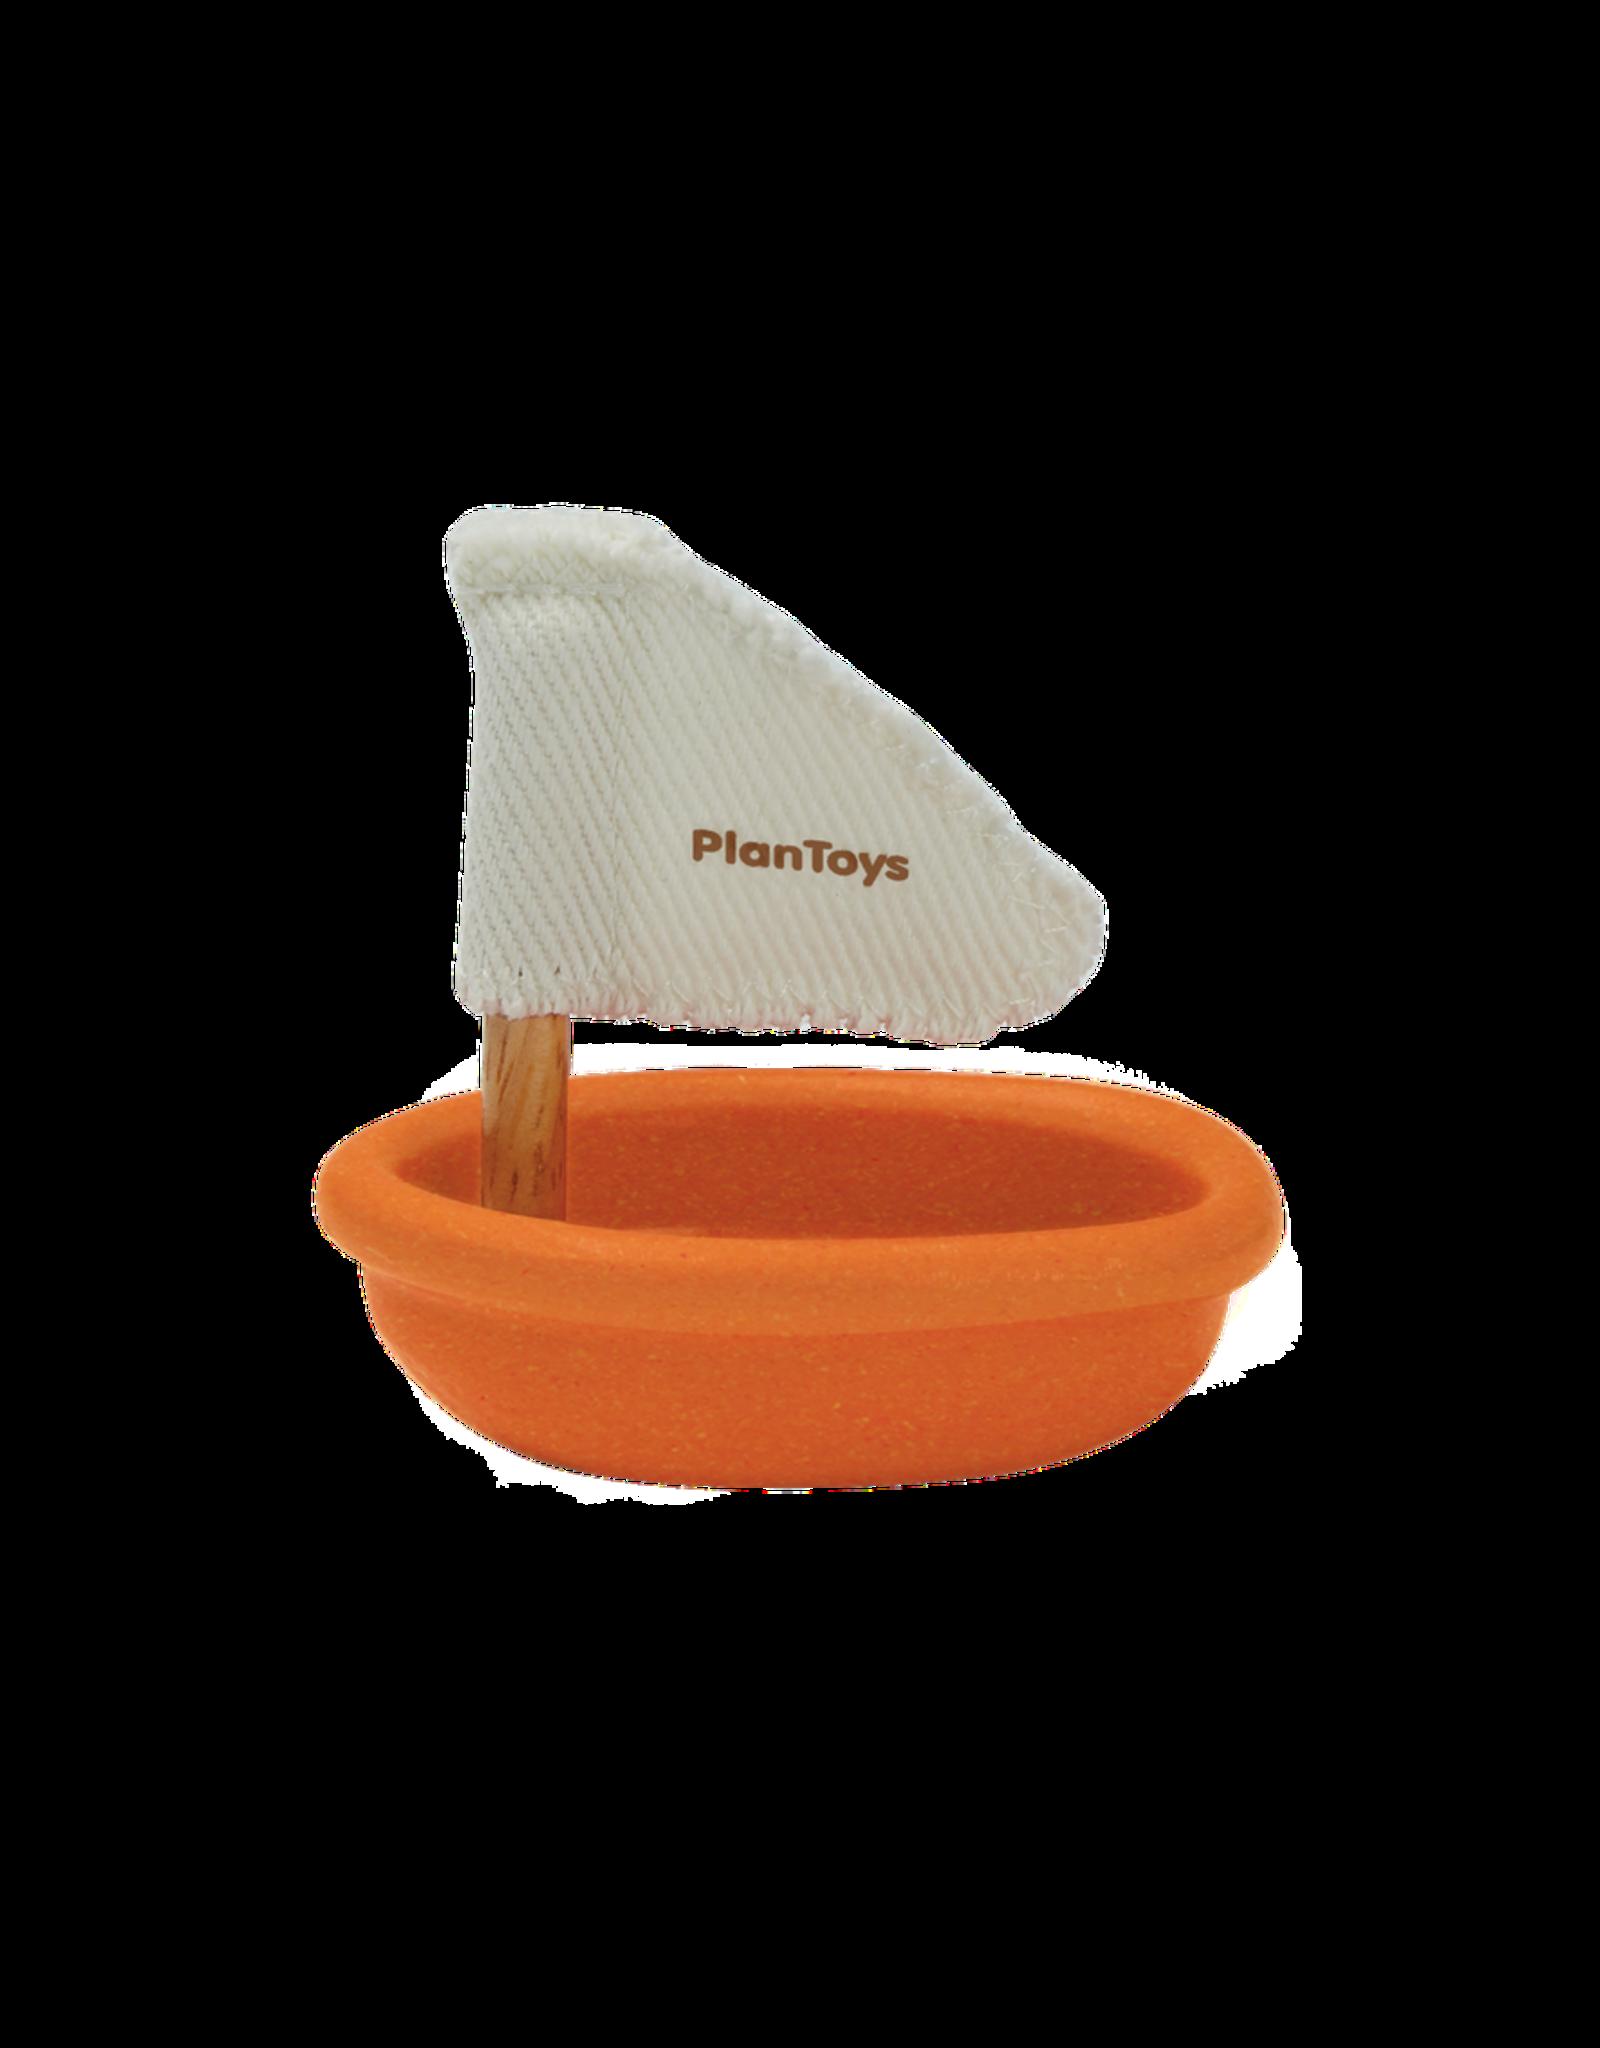 PlanToys Plan Toys Water Way Play Set